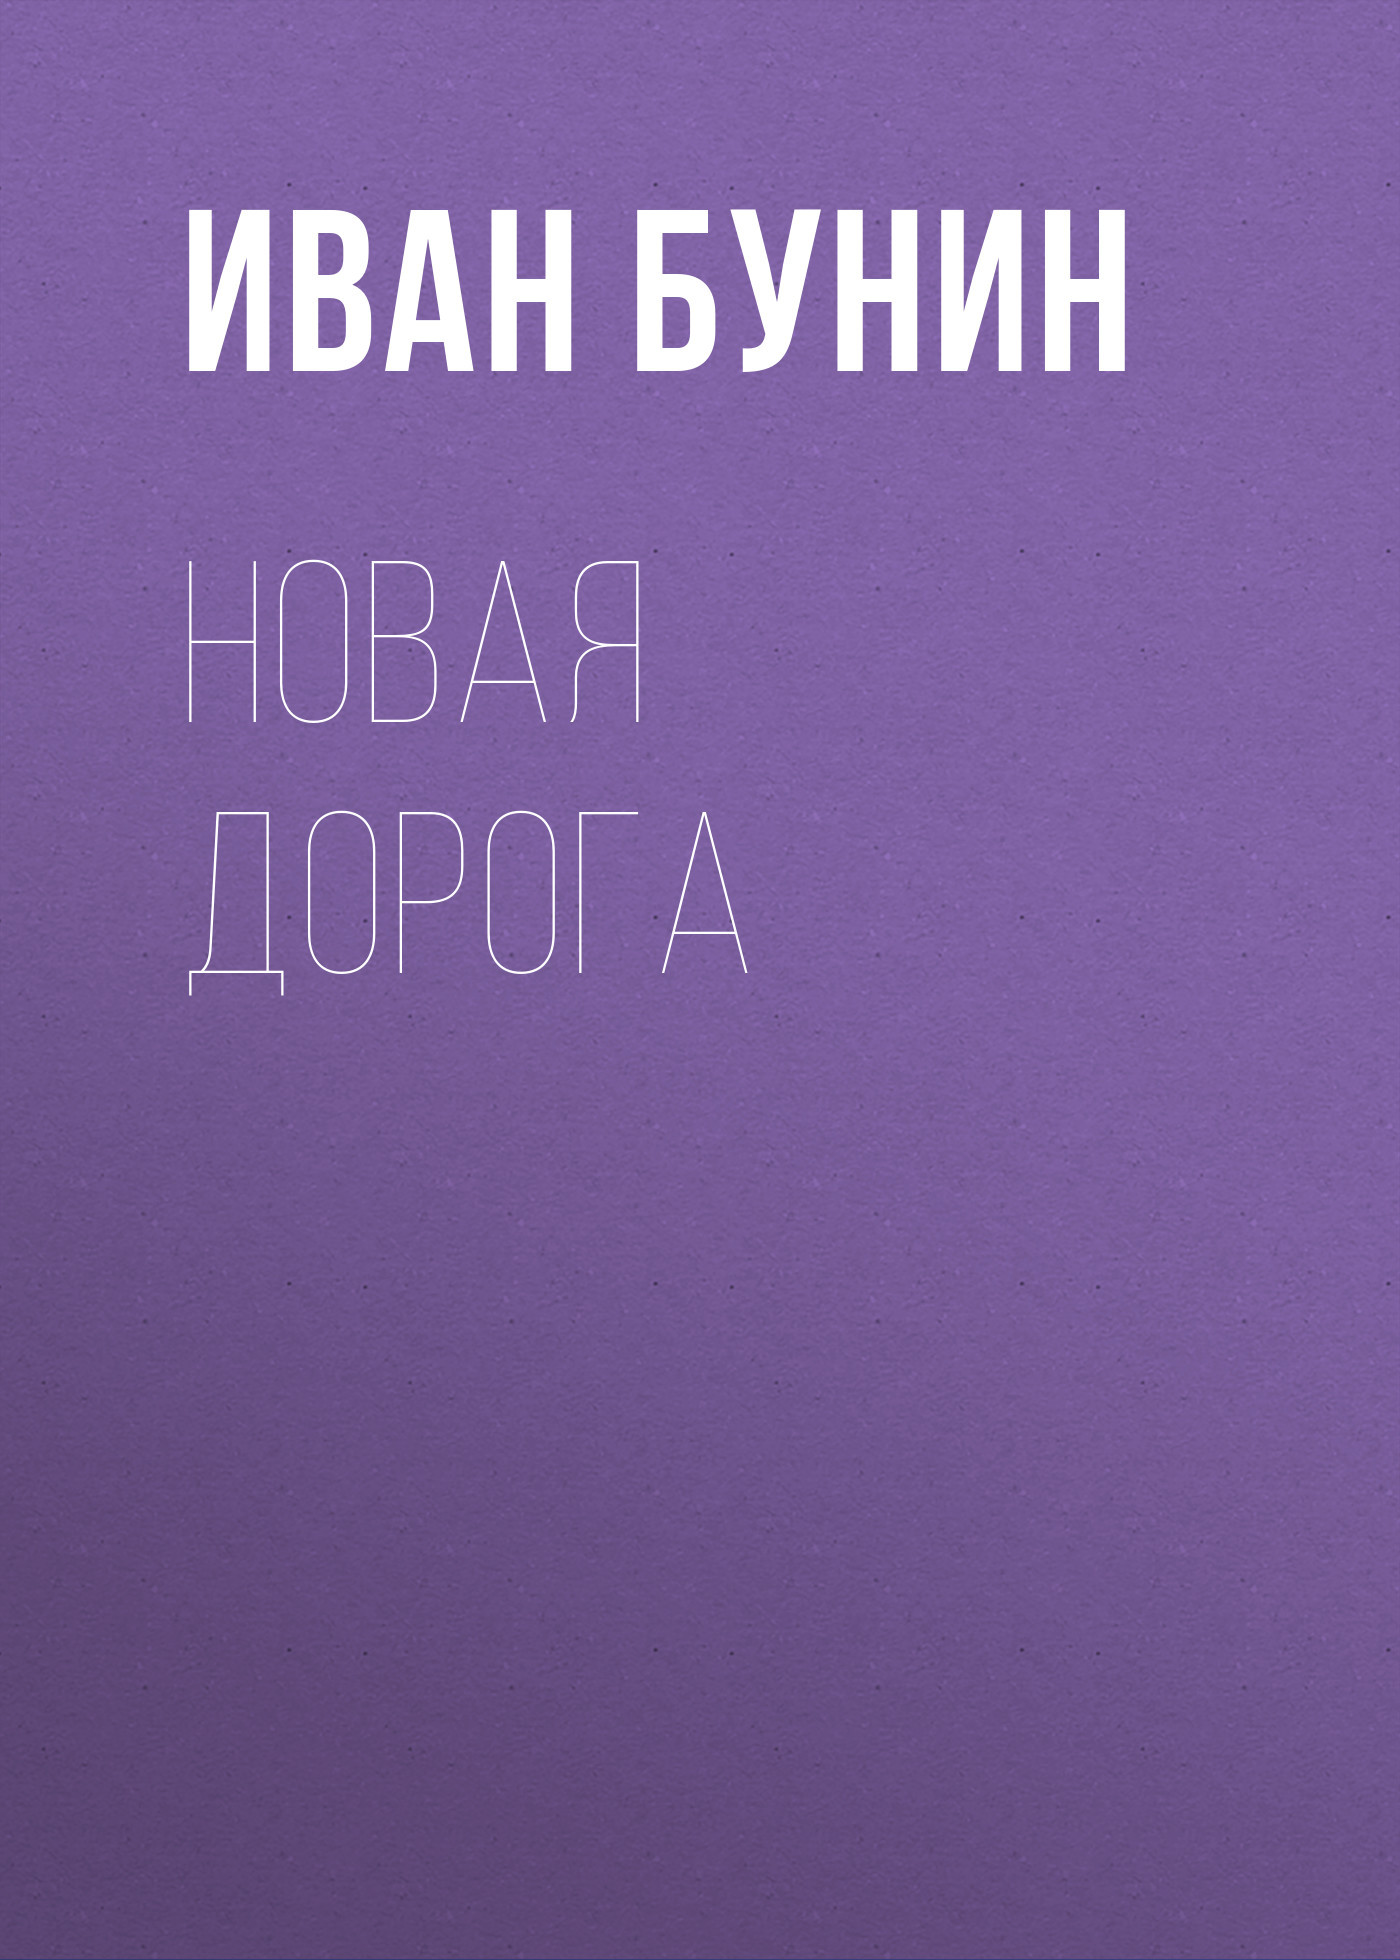 Иван Бунин. Новая дорога